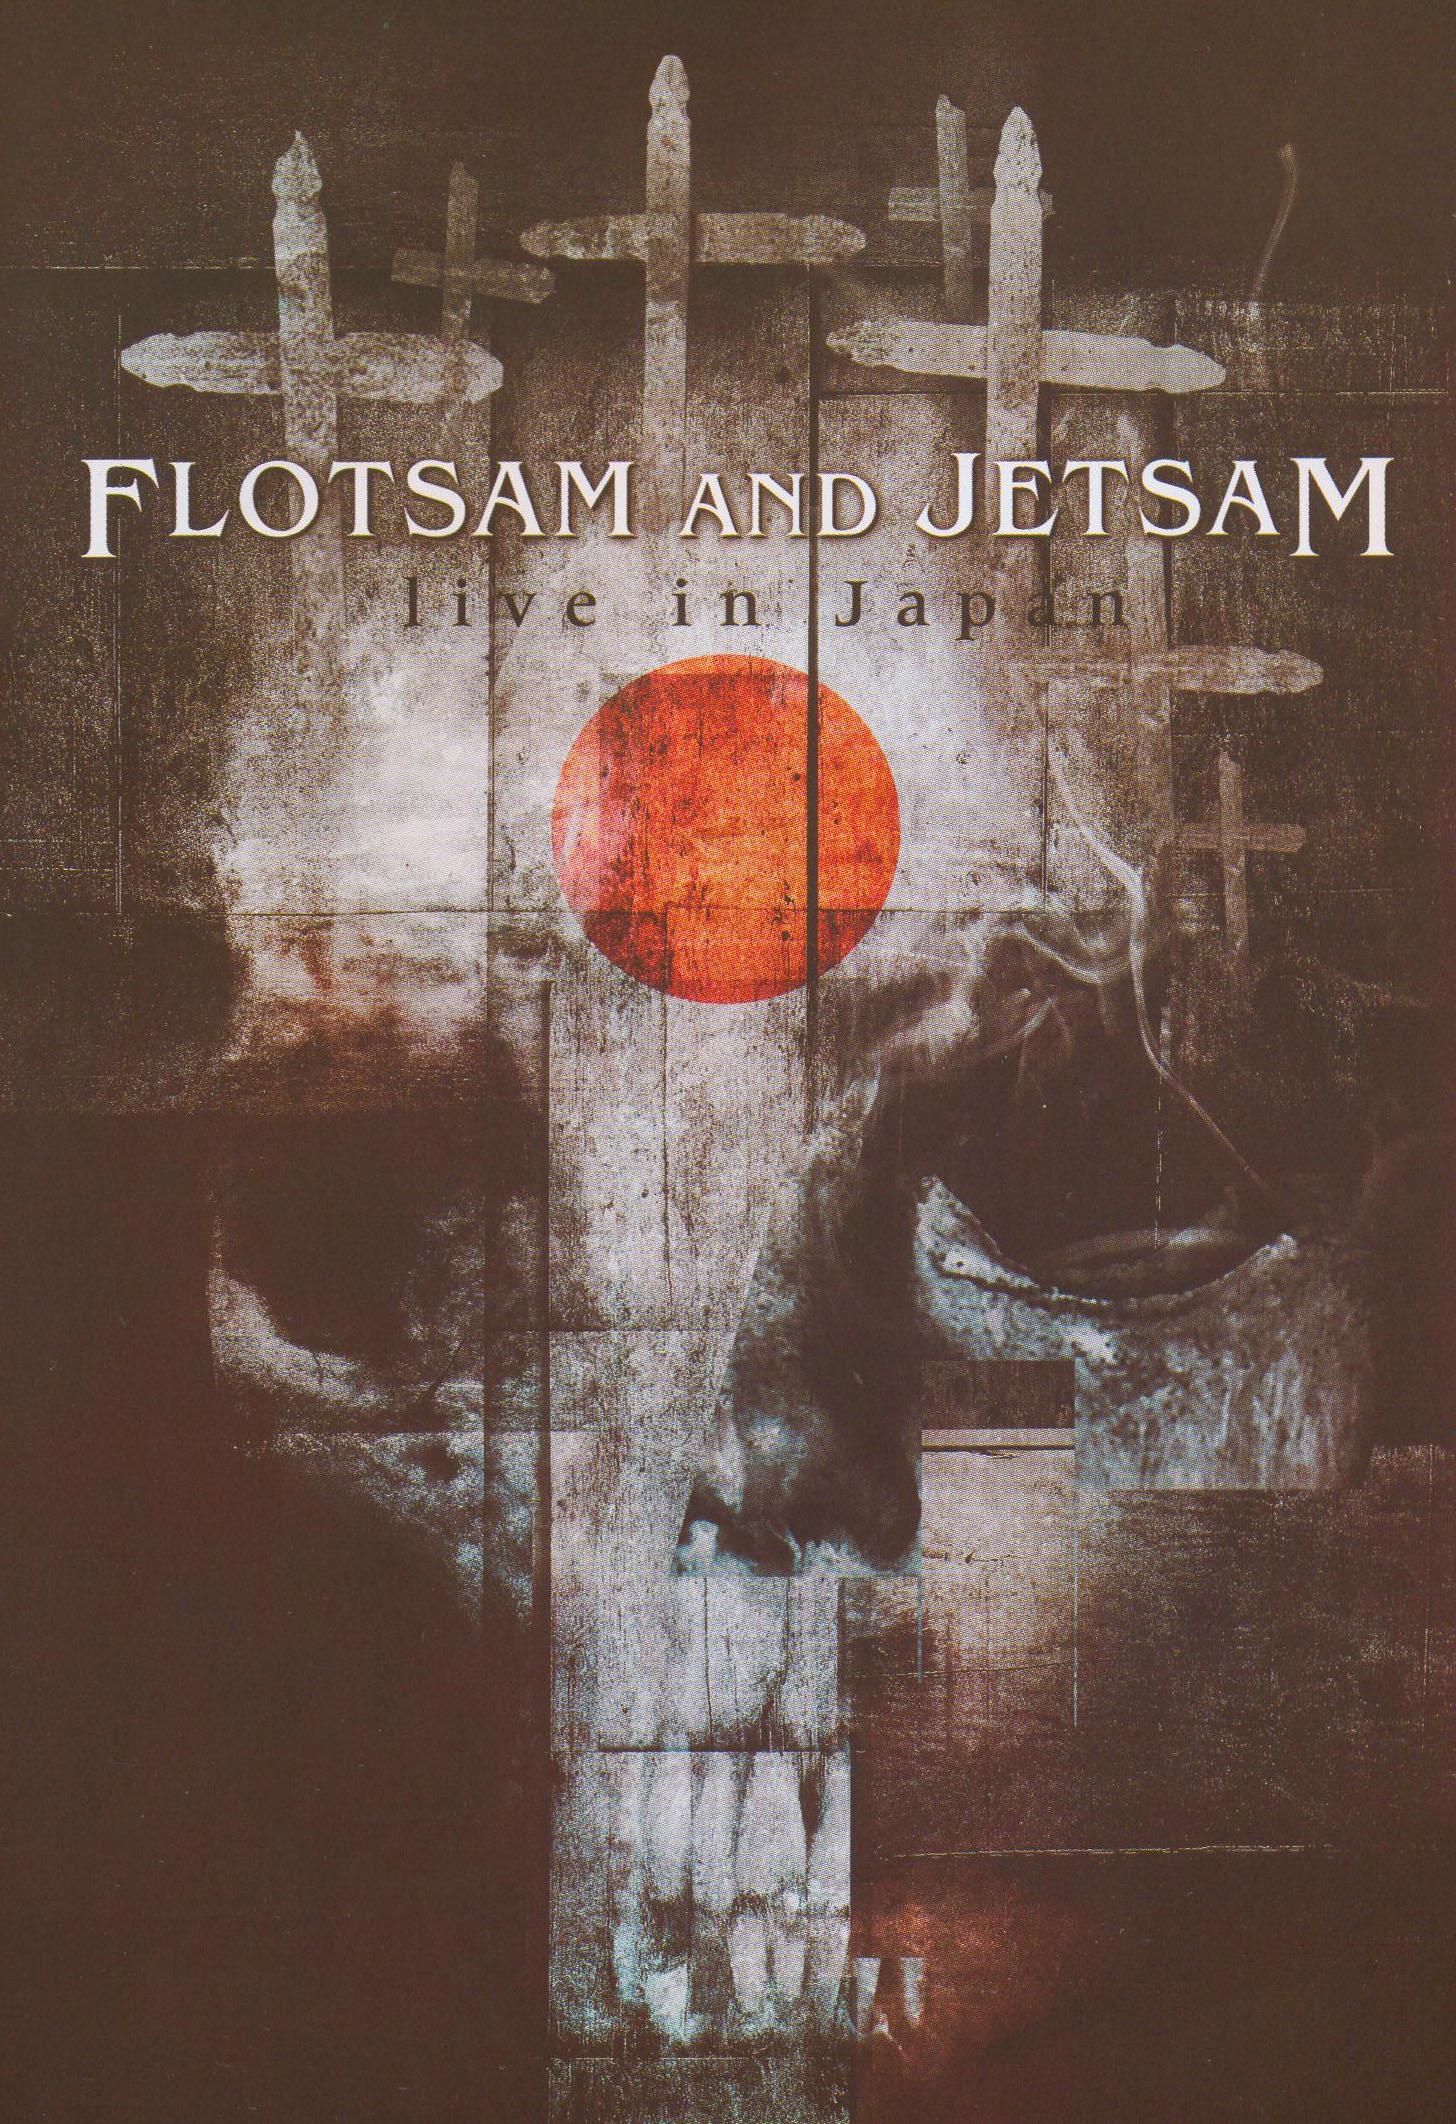 Flotsam and Jetsam: Live in Japan